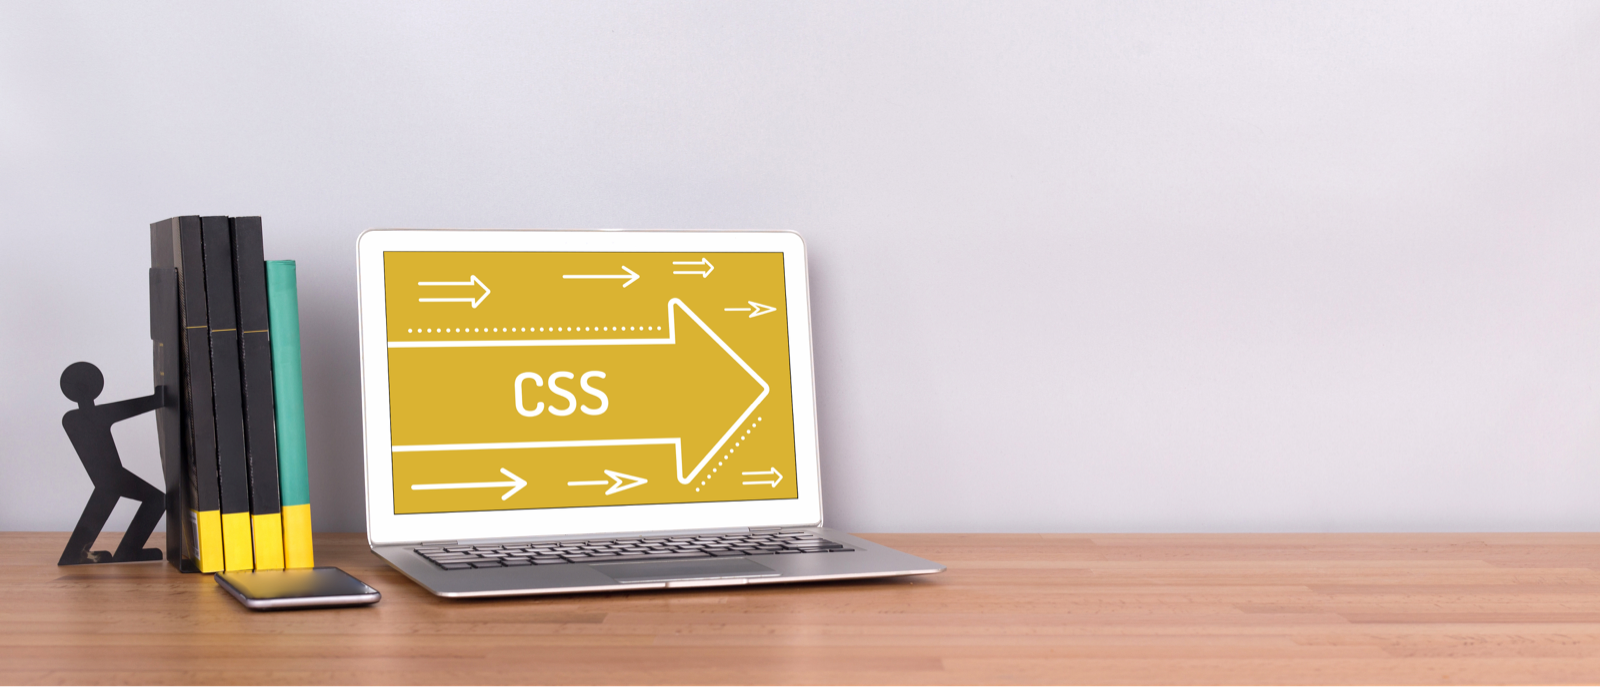 「CSS」と表示されているノートパソコンと、ブックエンドの本